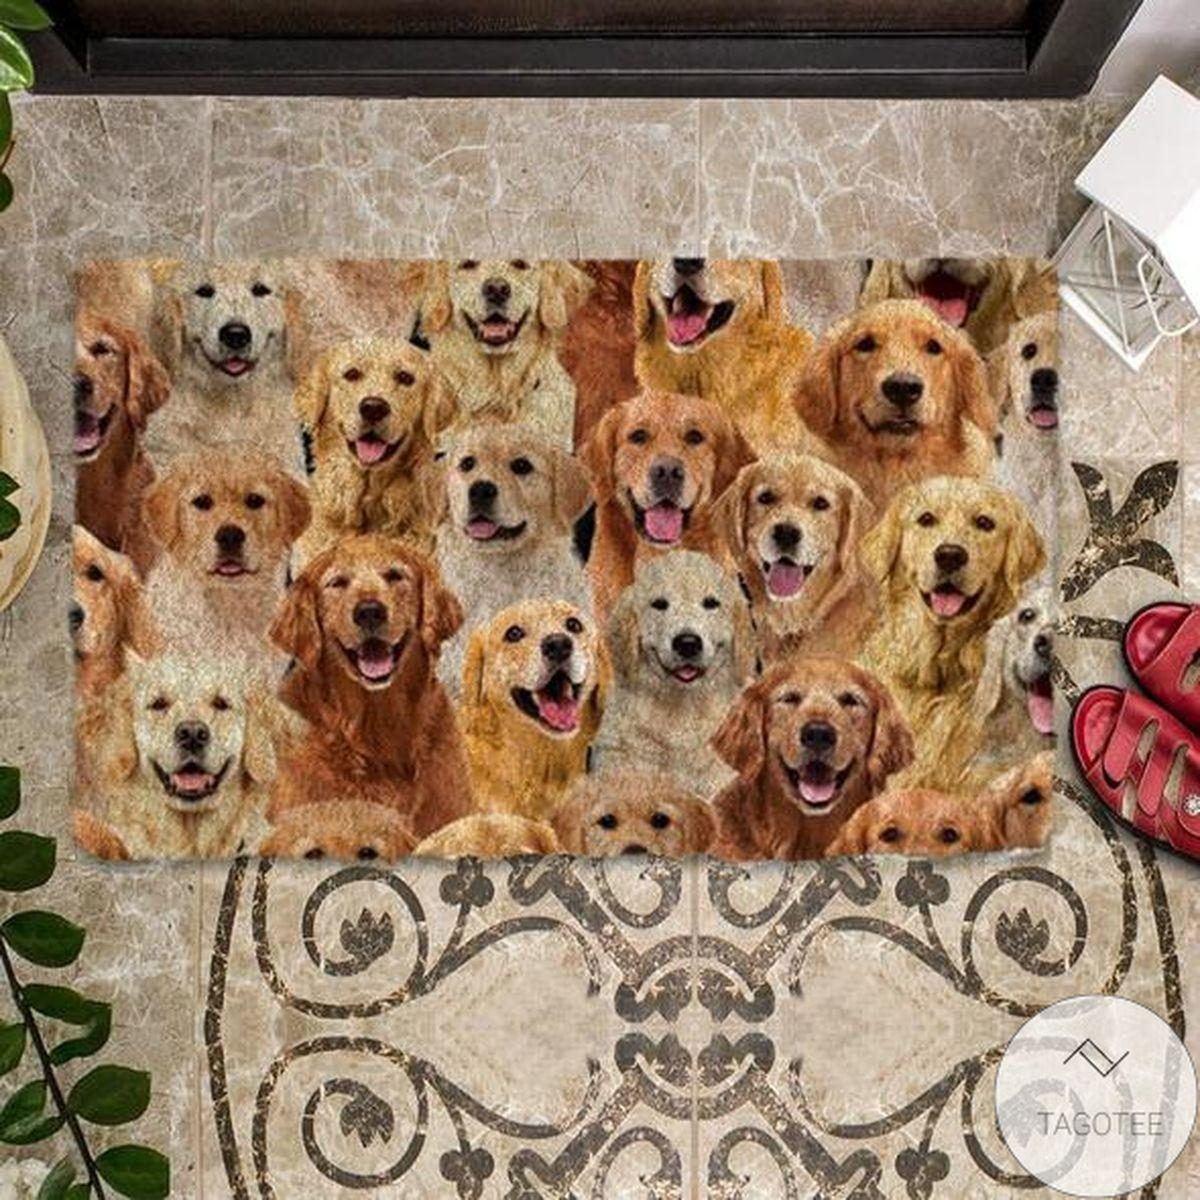 Hot Deal A bunch Of Golden Retrievers Doormat